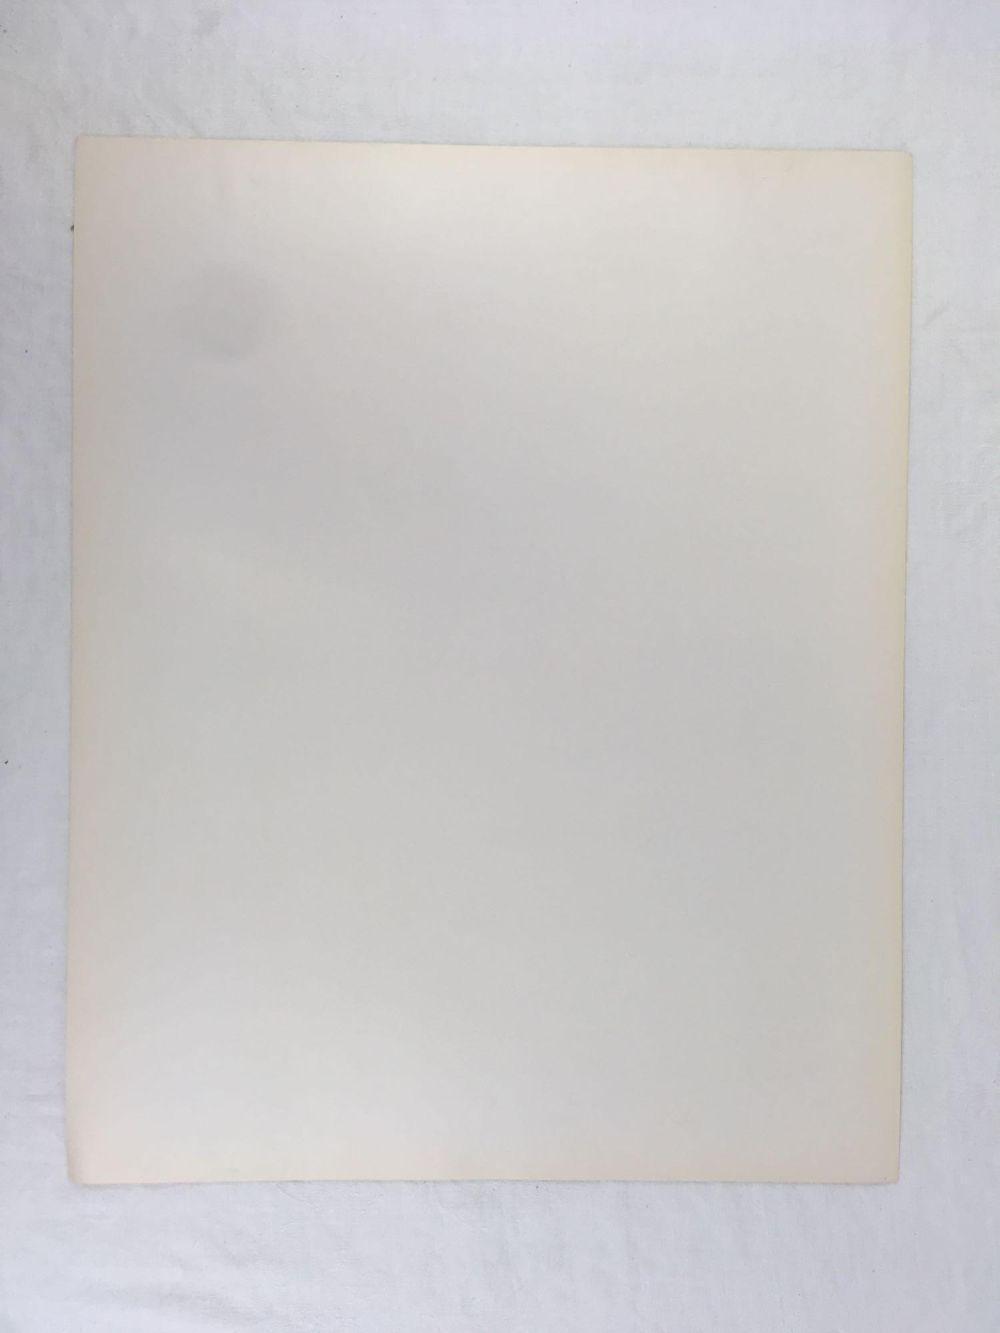 Lot 788: Vintage Naval History Poster